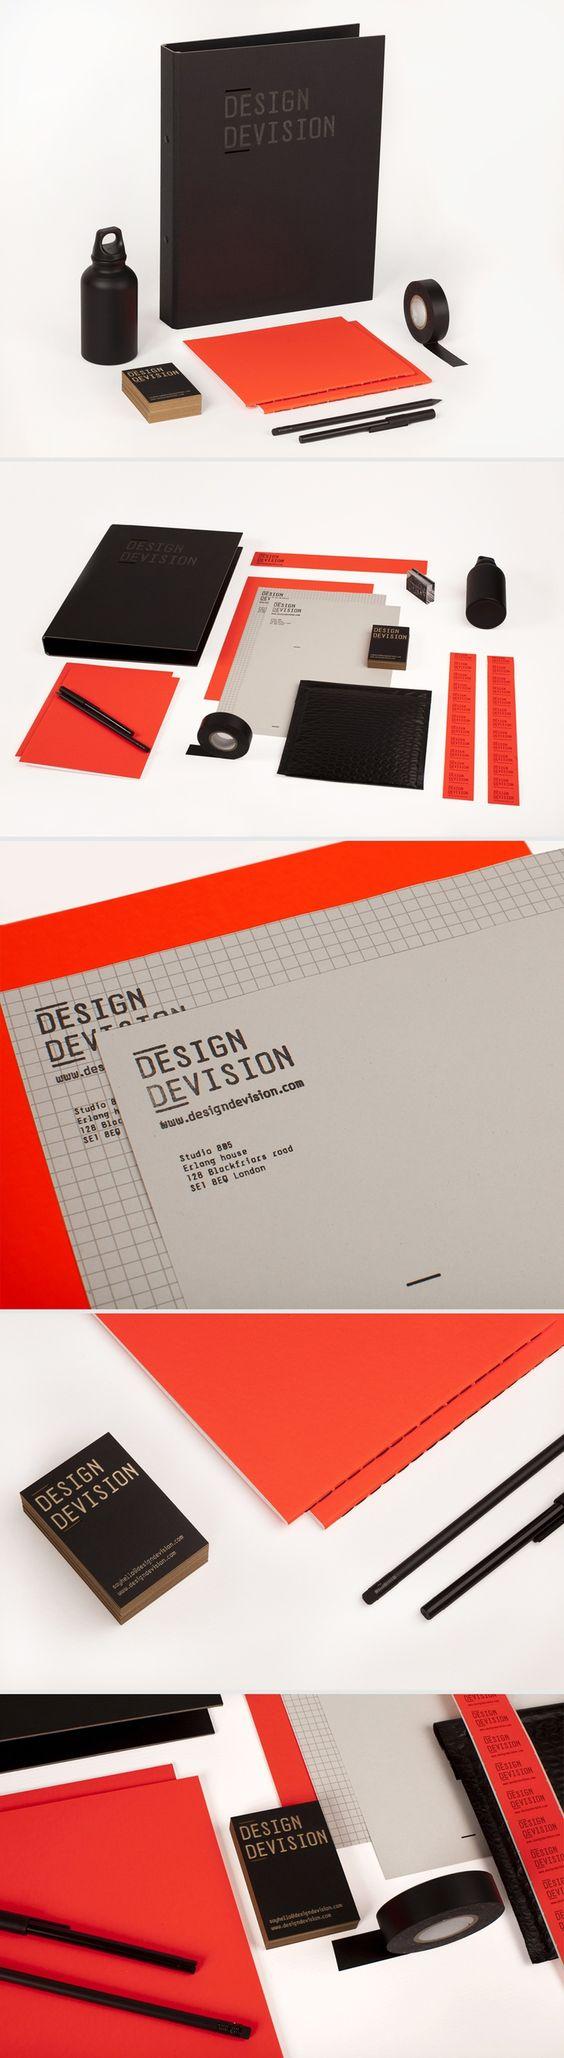 "Branding Identity ""Design Devision"""